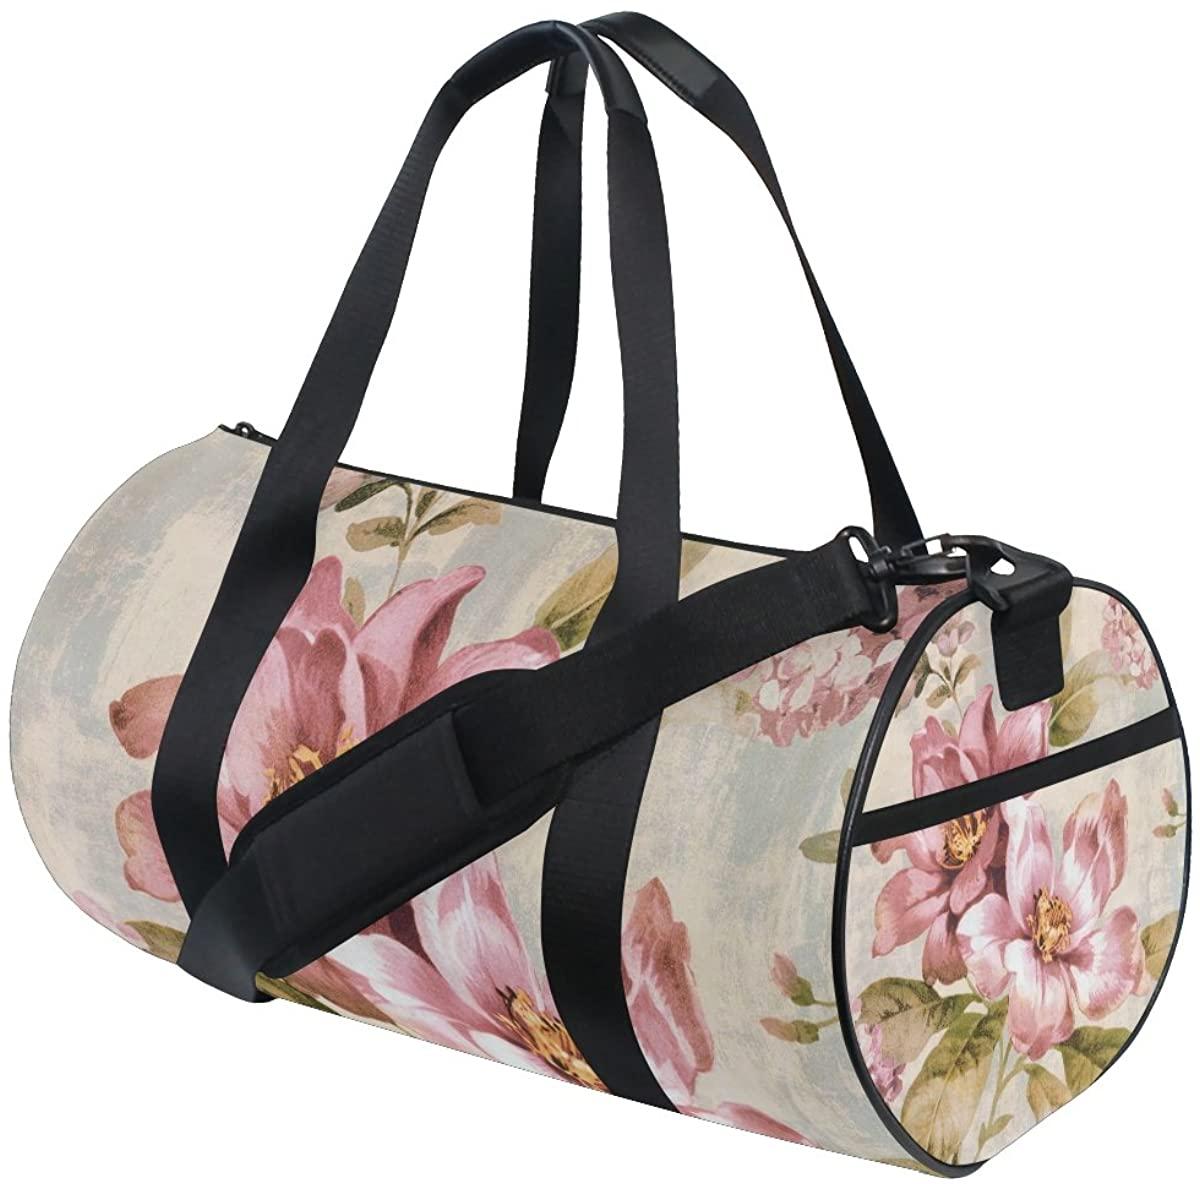 Duffel Tree Peony Fitness Gym Bags Canvas Sport Shoulder Bag for Men Women